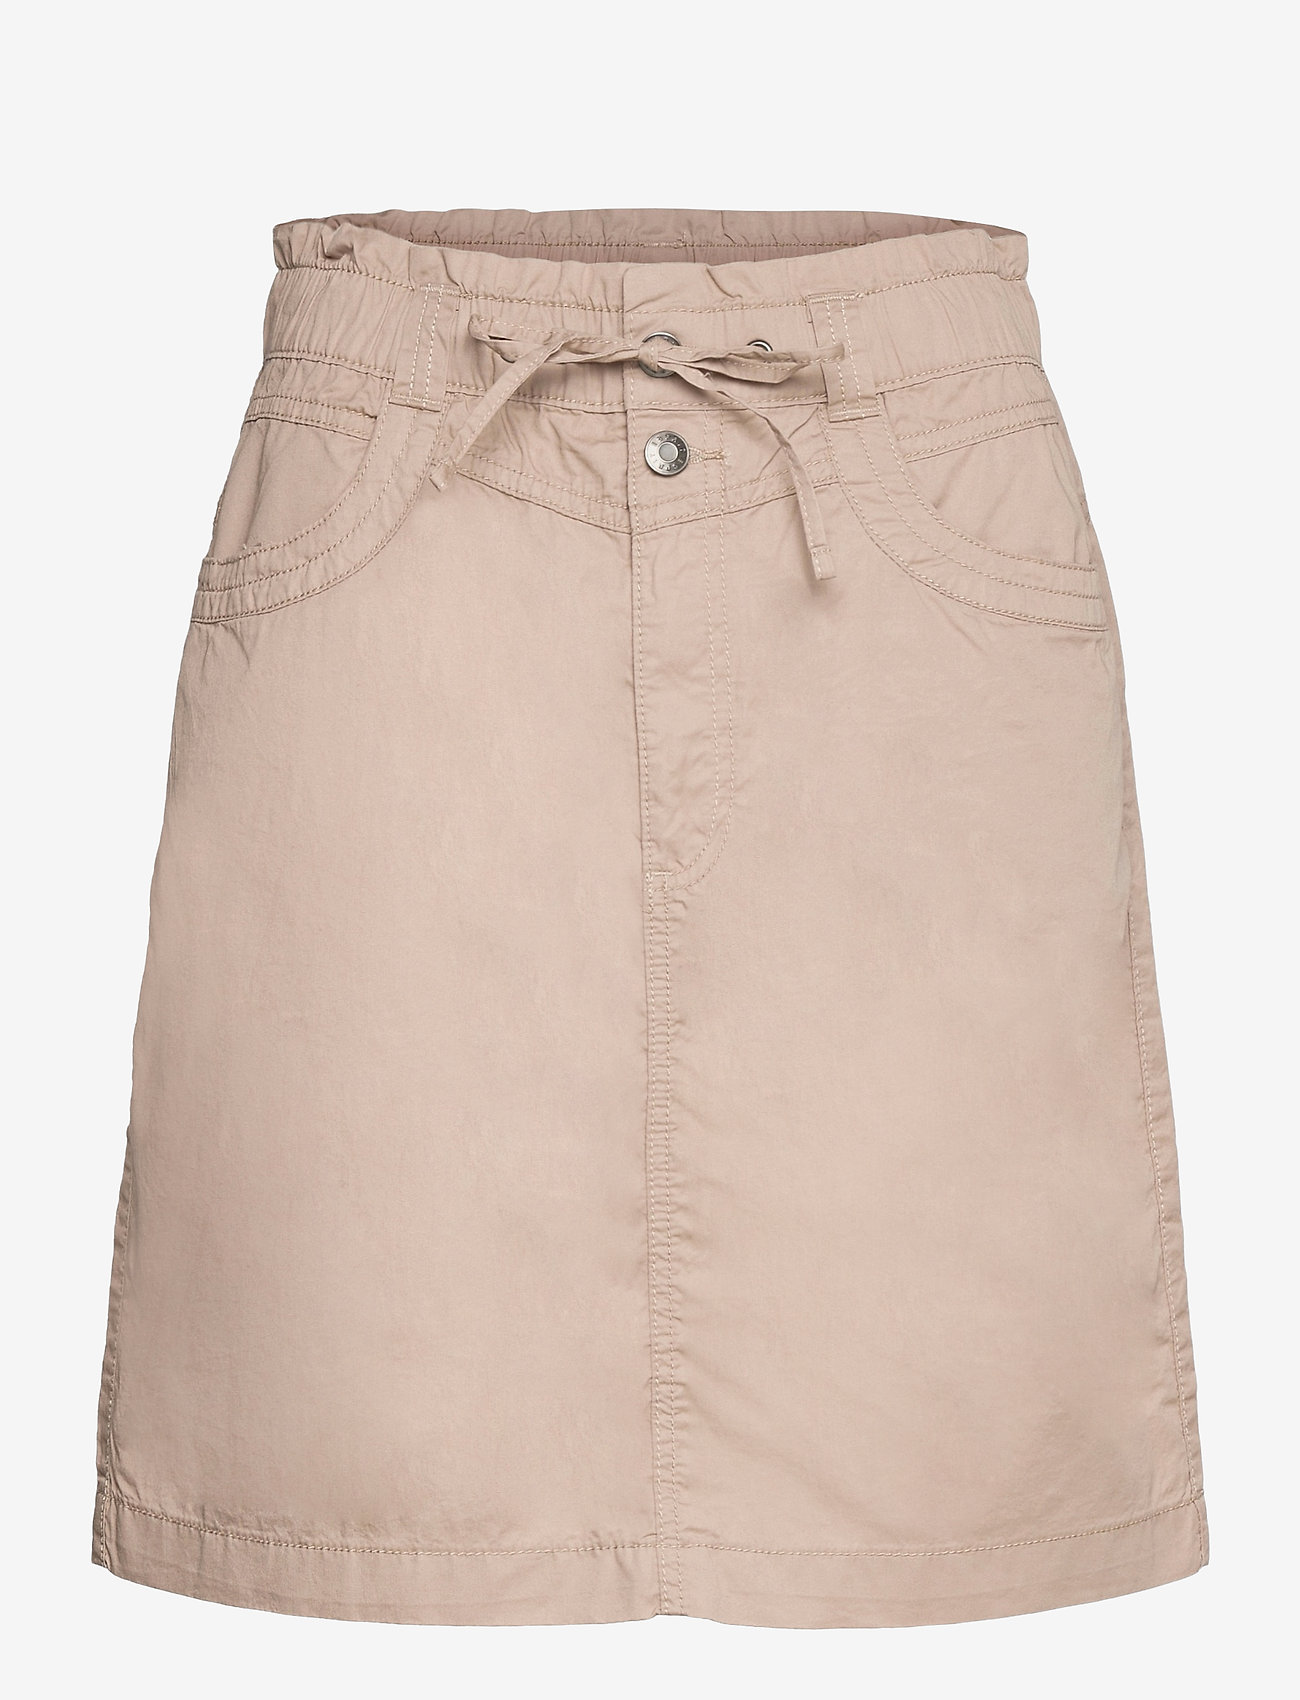 Esprit Casual - Skirts woven - korta kjolar - beige - 0